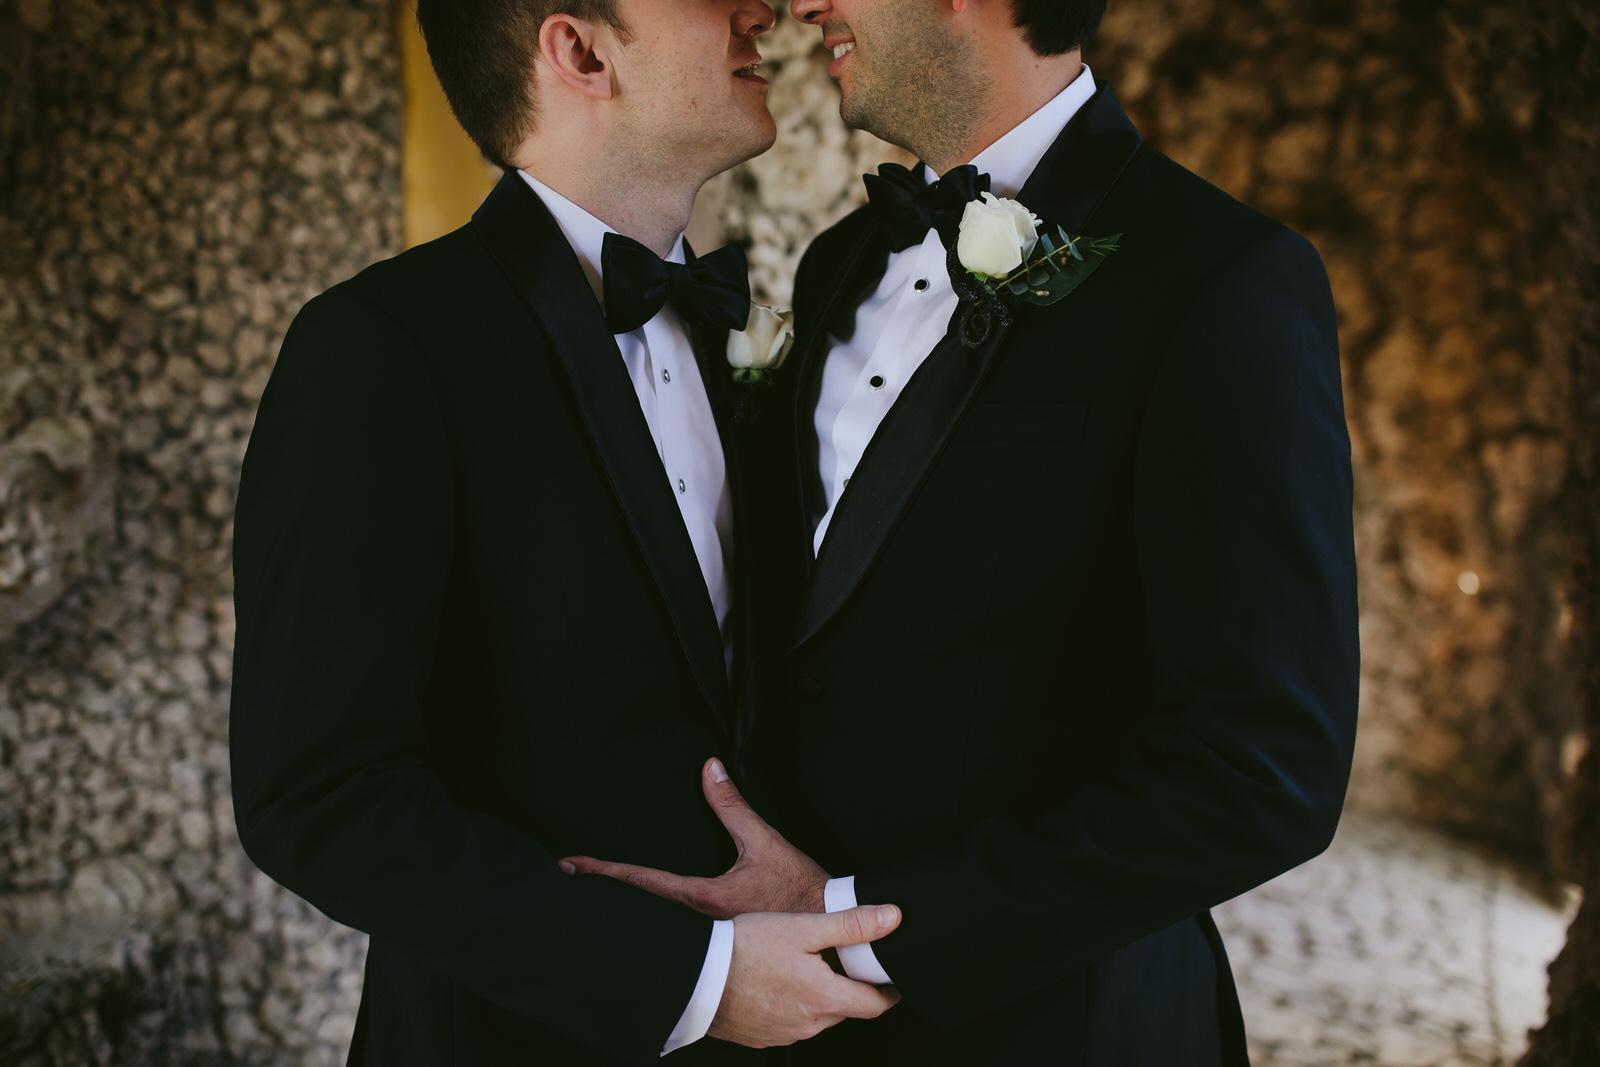 vizcaya_elopement_intimate_wedding_portraits_tiny_house_photo-21.jpg